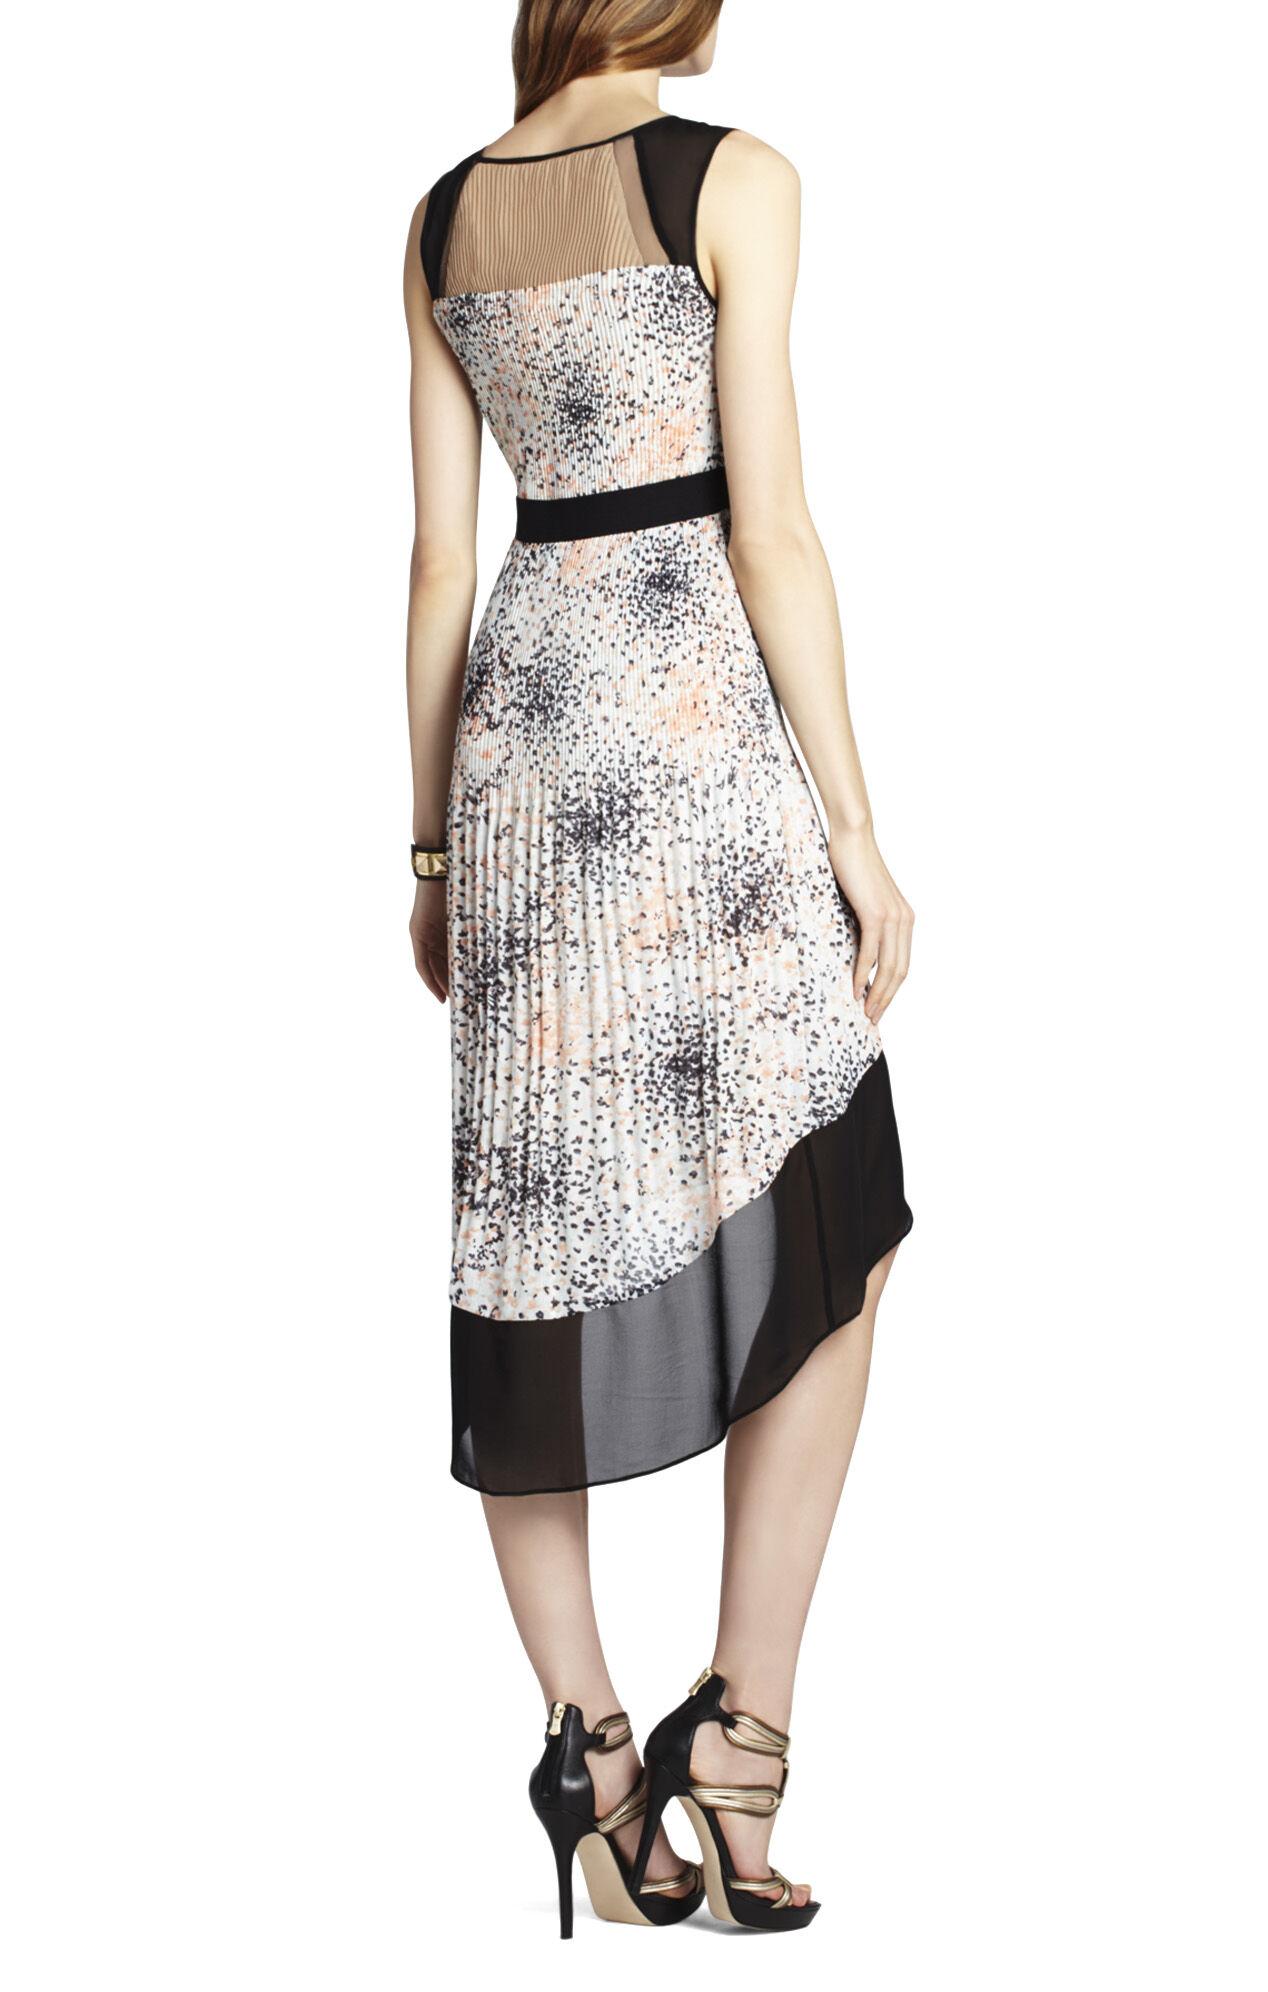 Alicia Pleated Dress